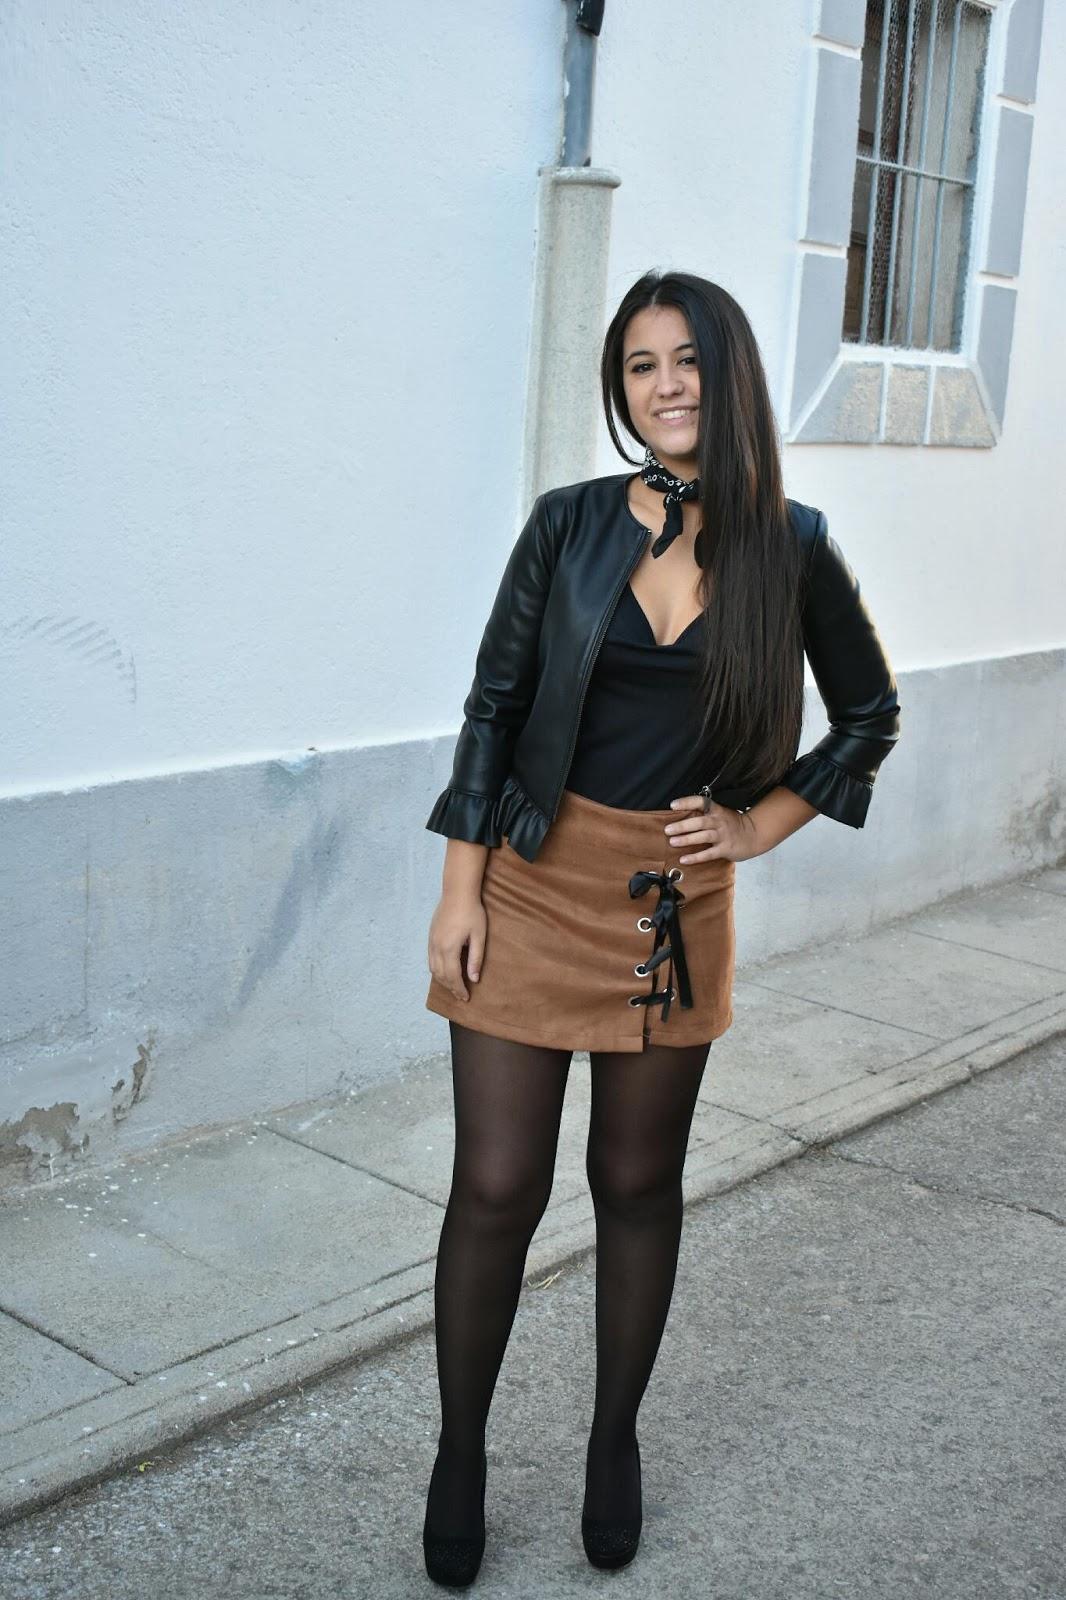 Style eclectic www.retrosonja.com - Fashionmylegs : The